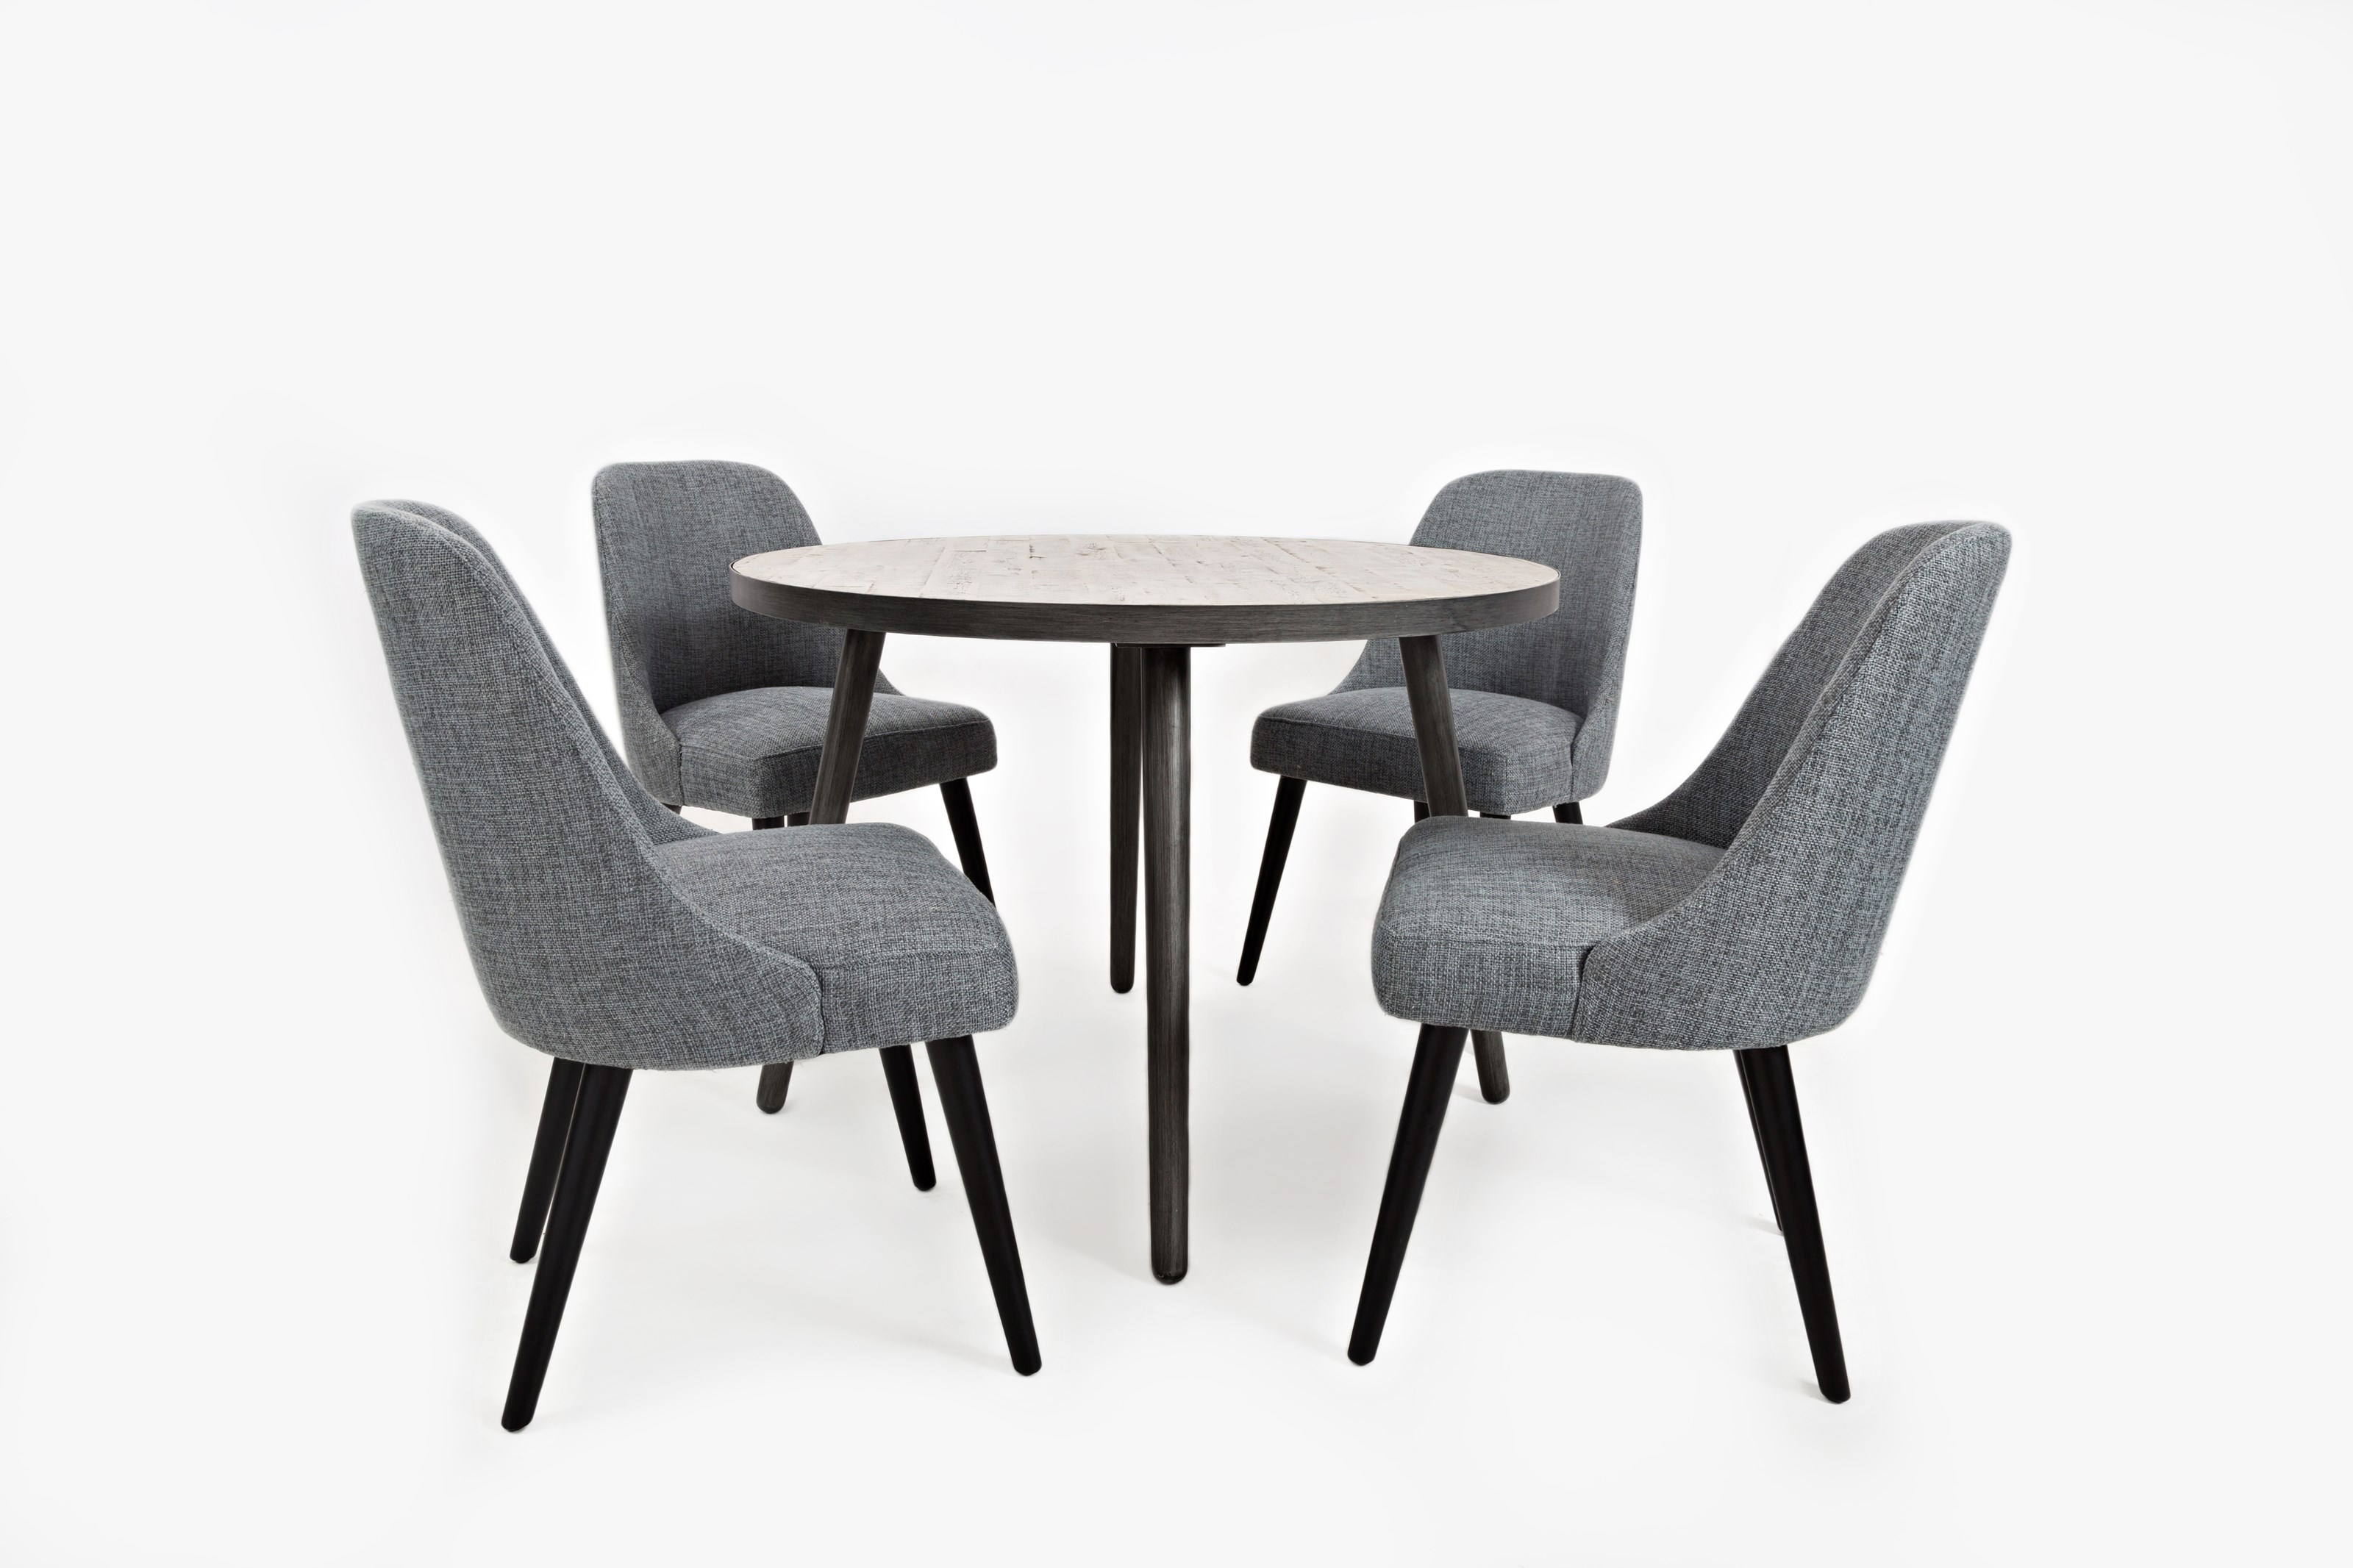 Jofran American Retrospective Round Dining Table And Chair Set - 42 round dining table and chairs